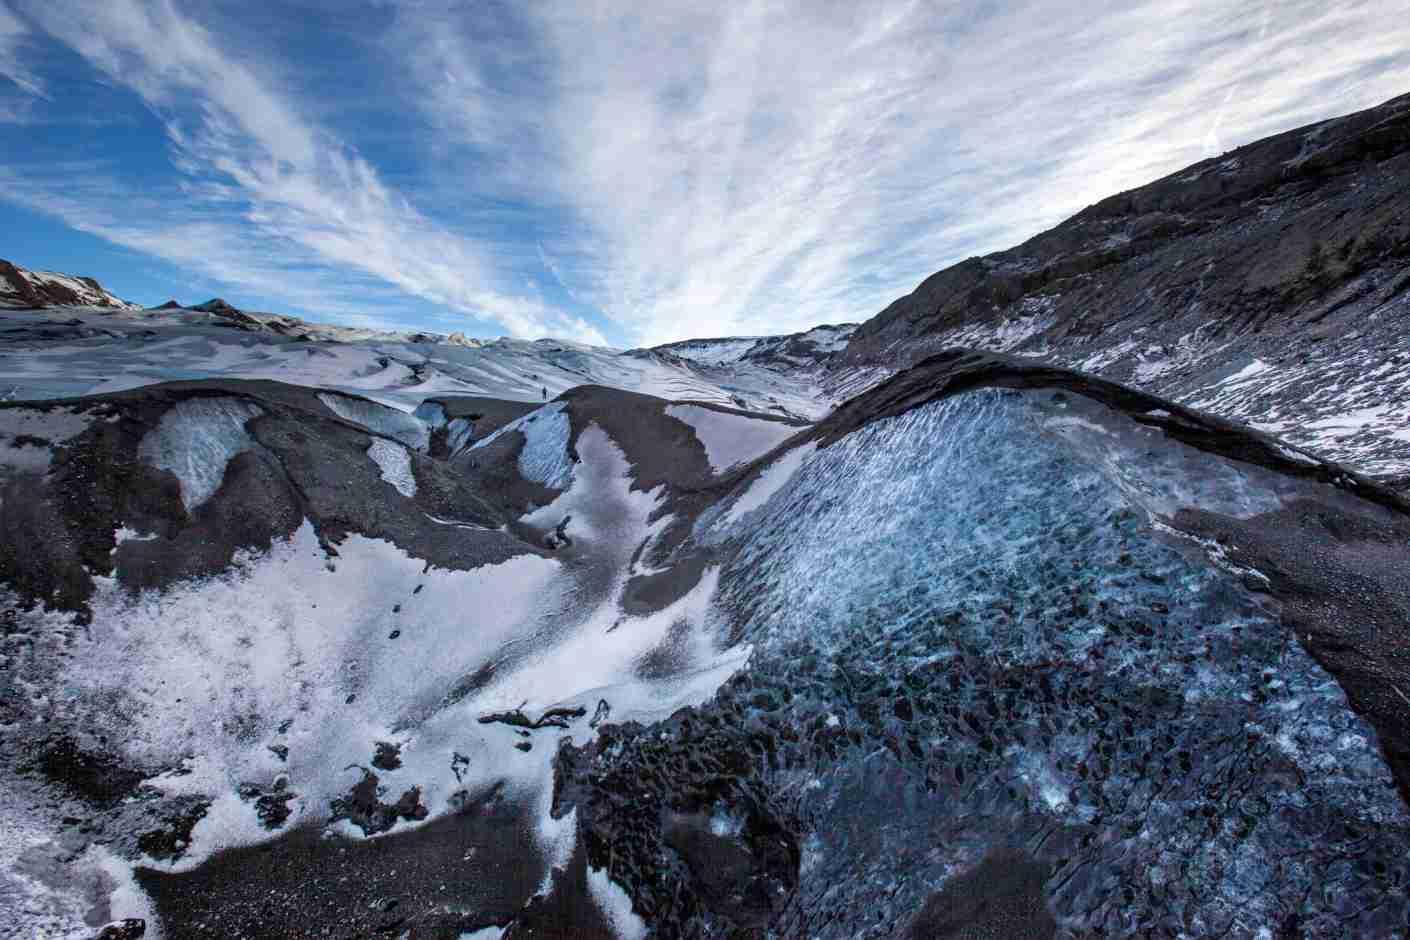 Photo of Sólheimajökull Glacier by Snorri Gunnarsson / Getty Images.